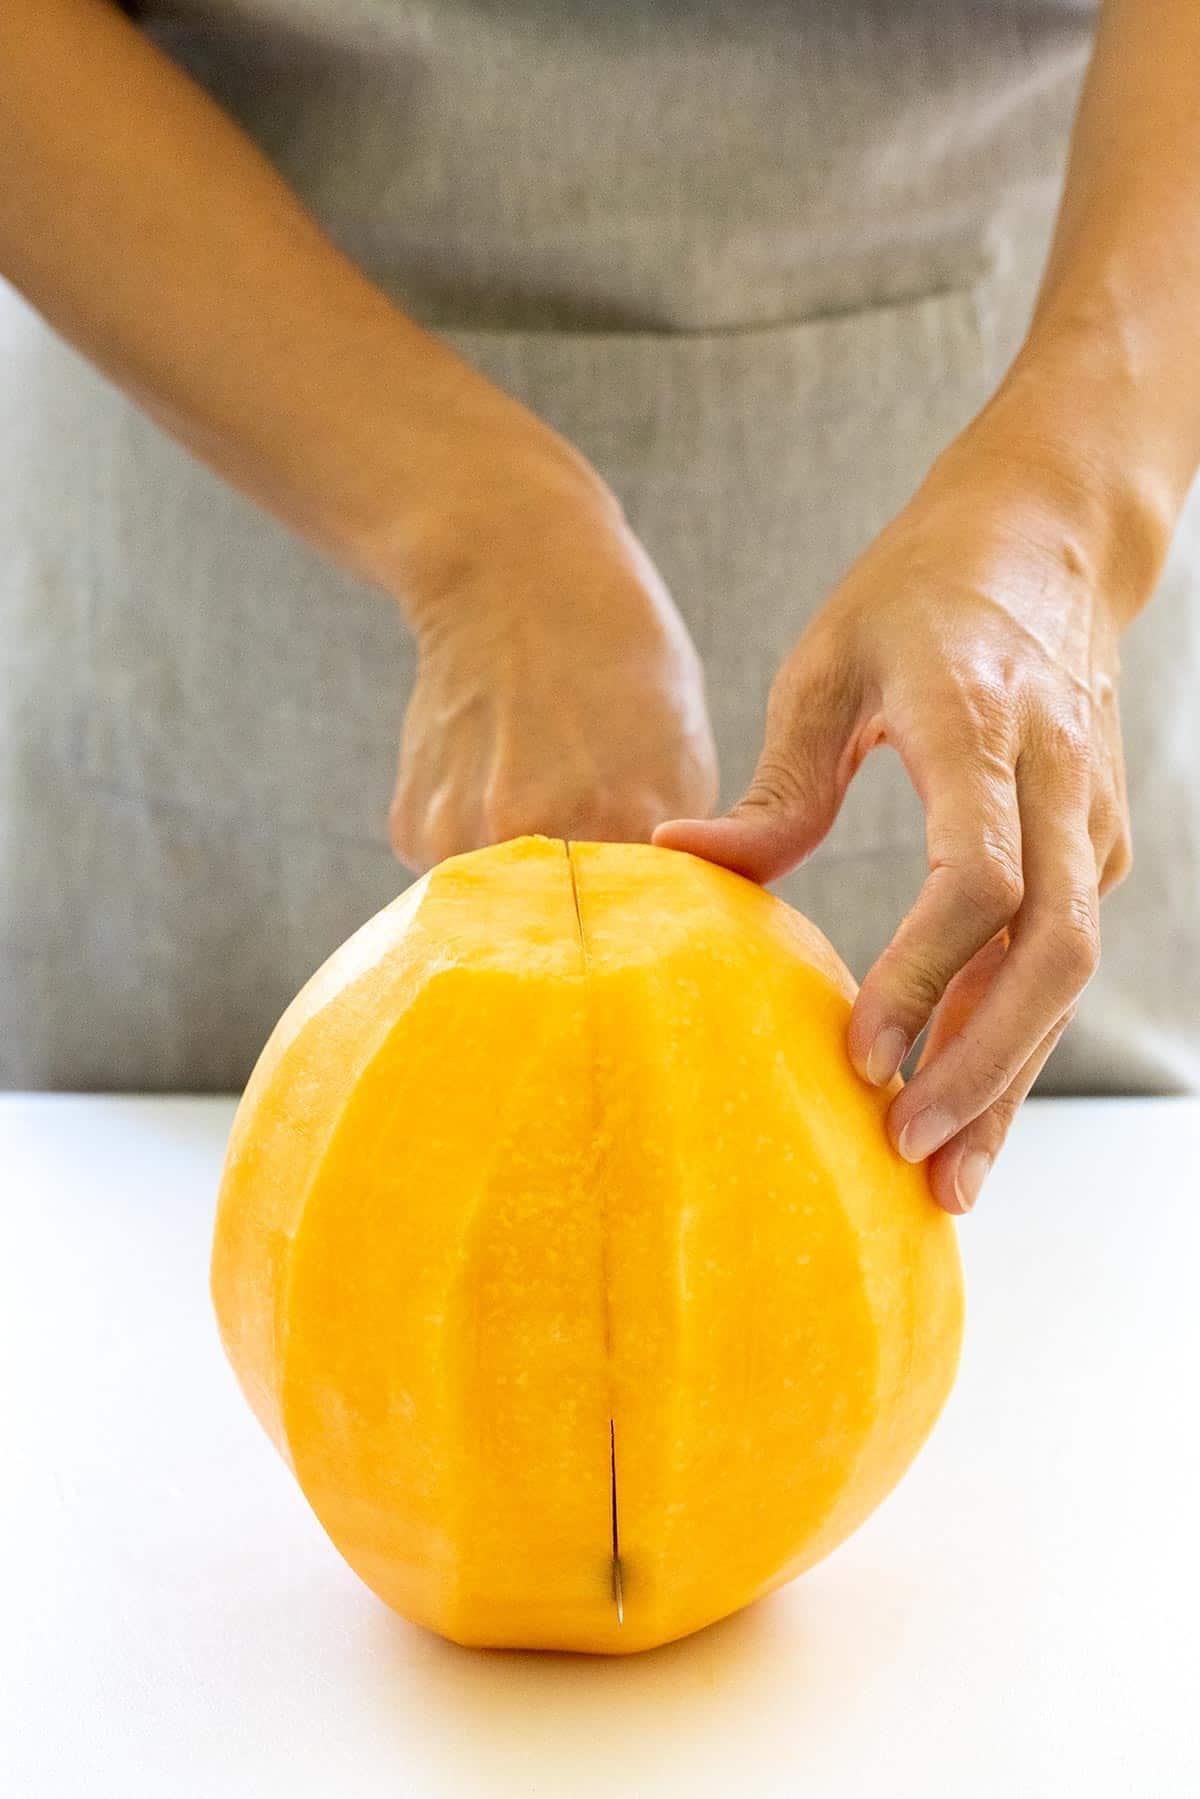 cutting a melon into halves